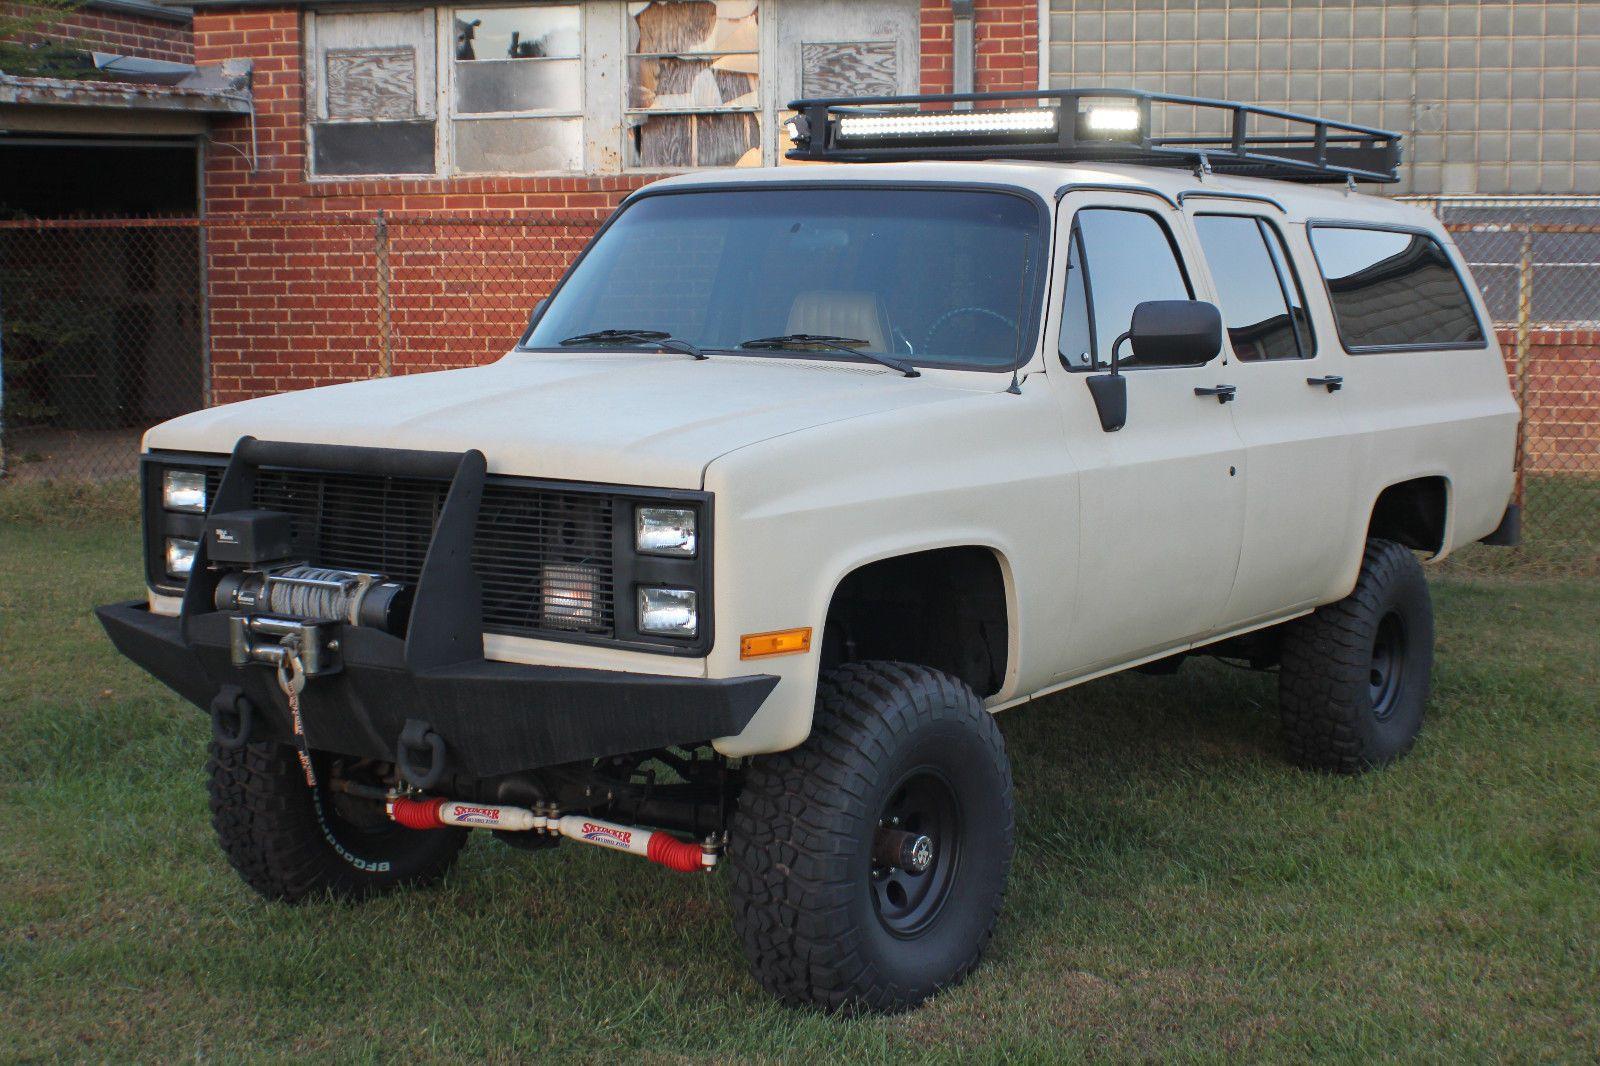 Fully Customized 1985 Chevrolet Suburban